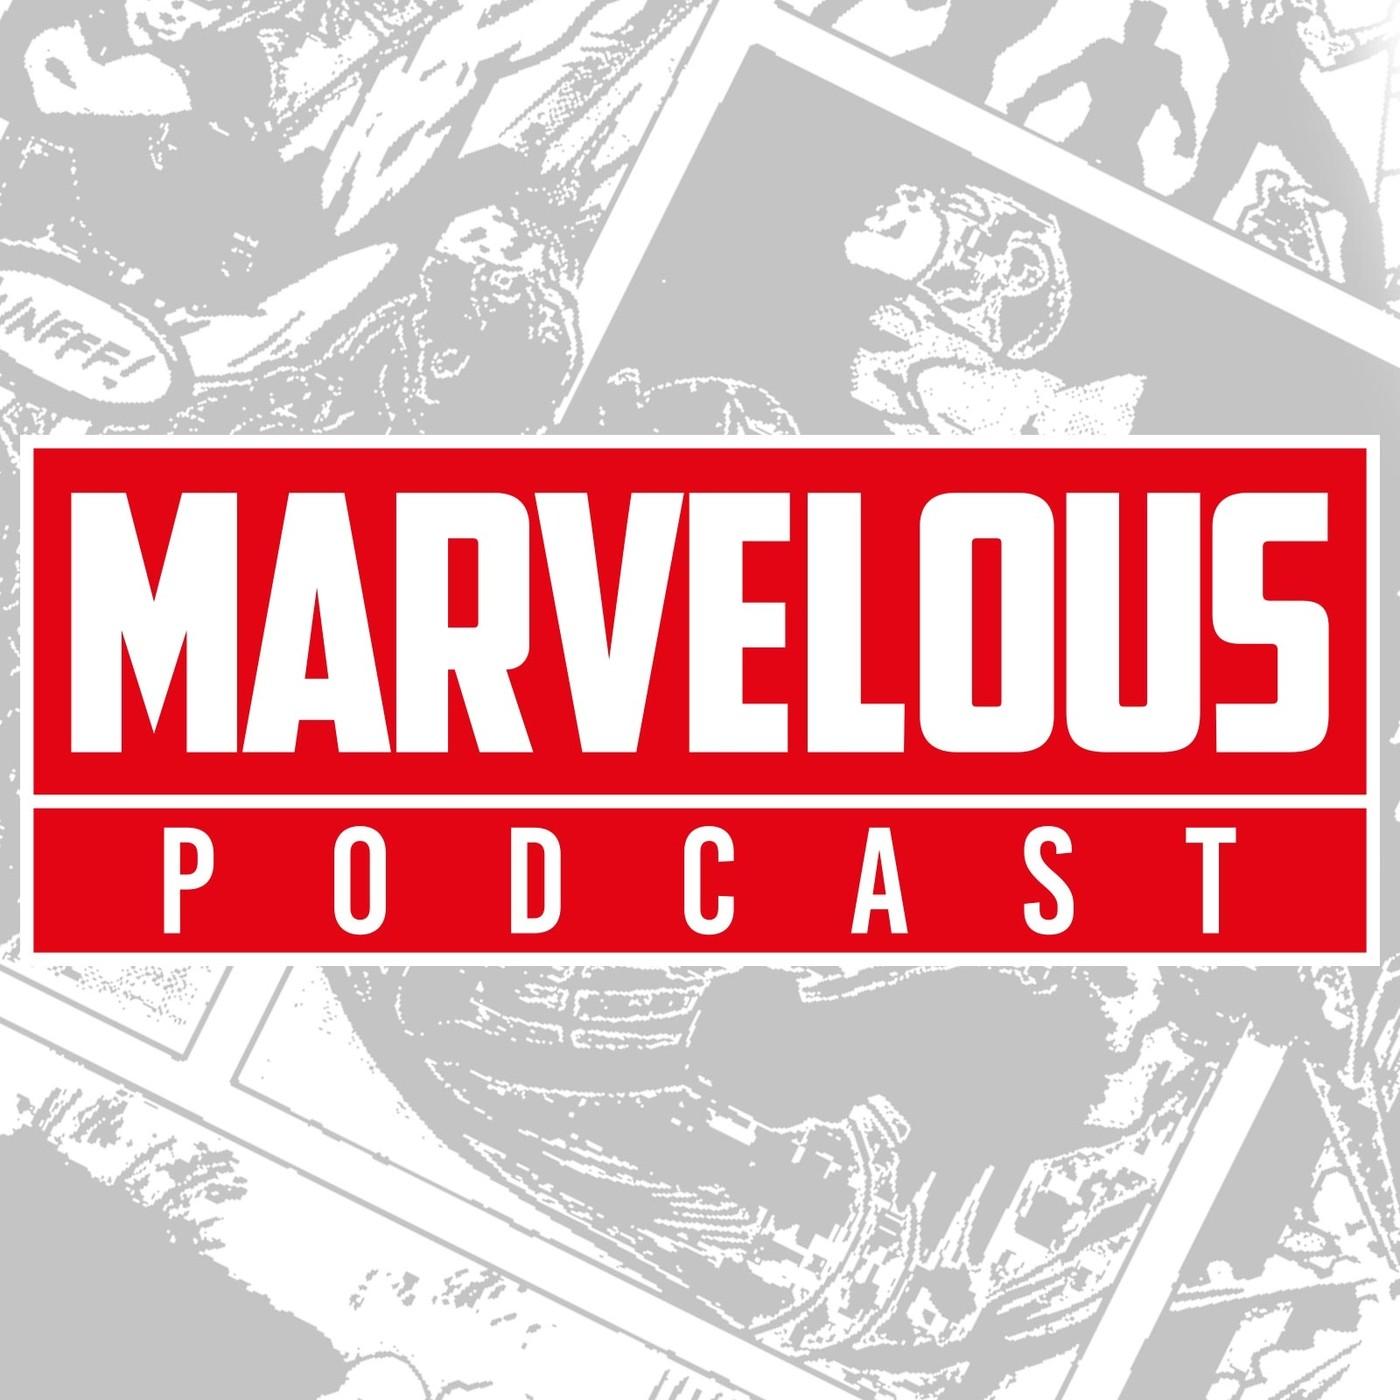 Marvelous Podcast